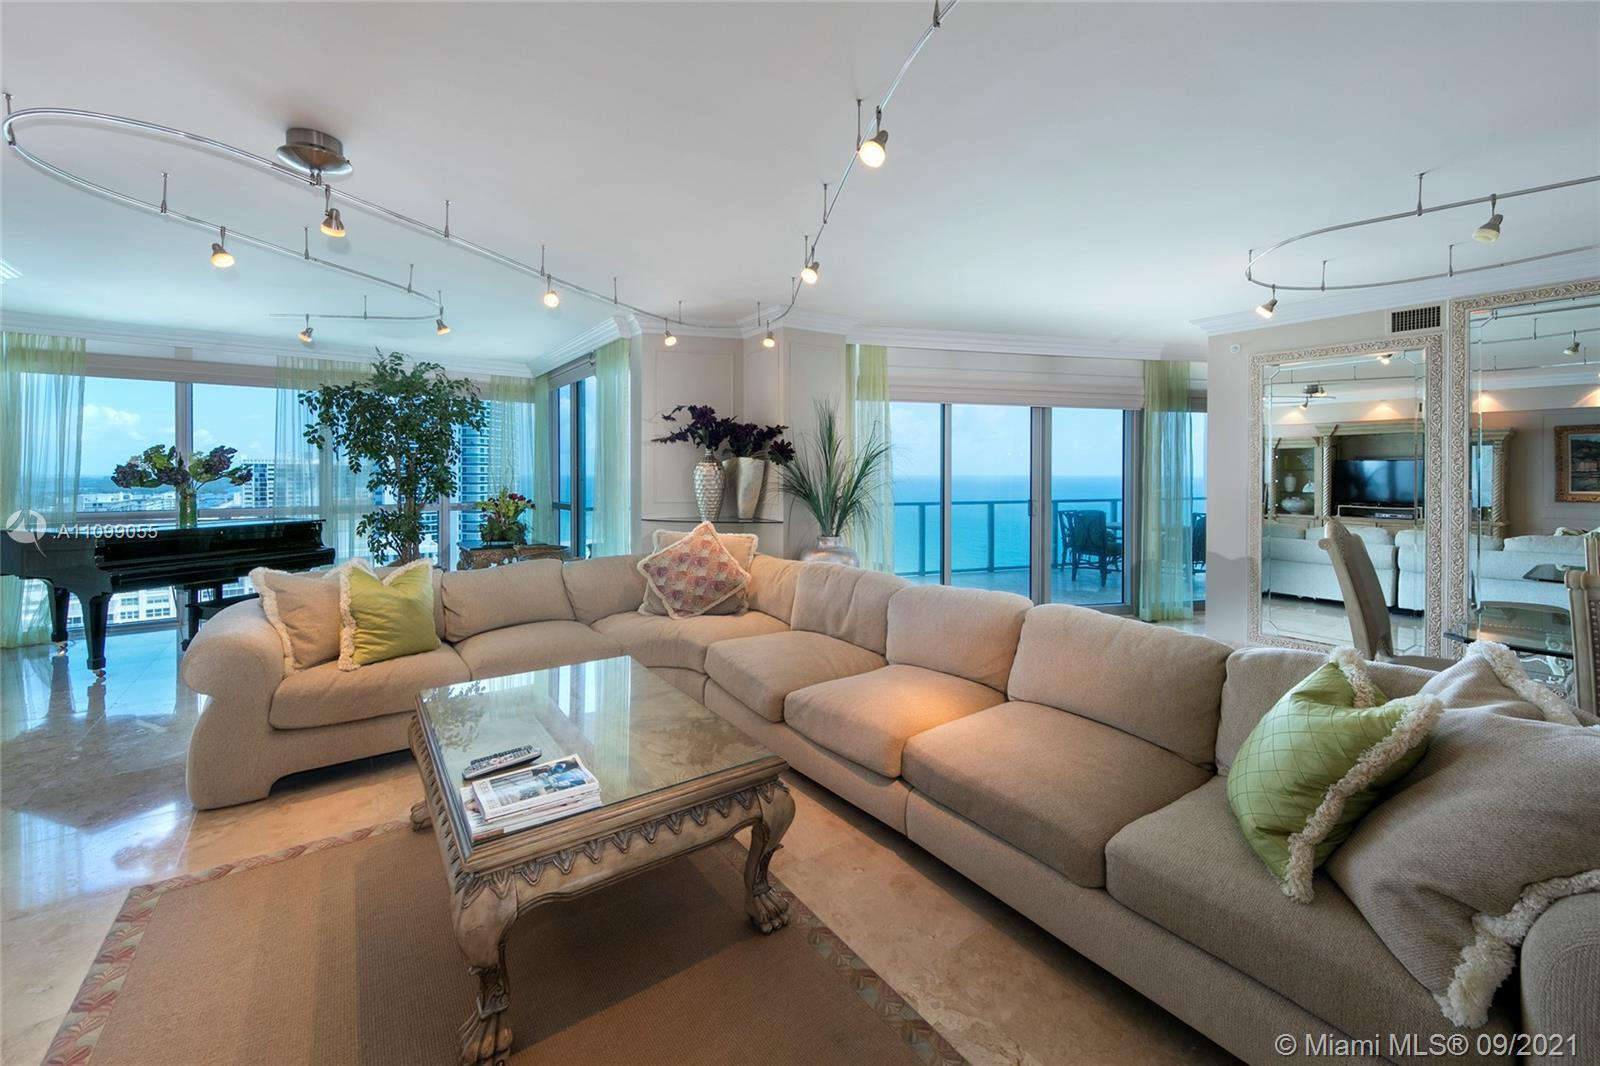 Spacious 3,466sf 4 bed/3.5 bath condo at Ocean Palms. Enjoy the ocean and Intracoastal views in this